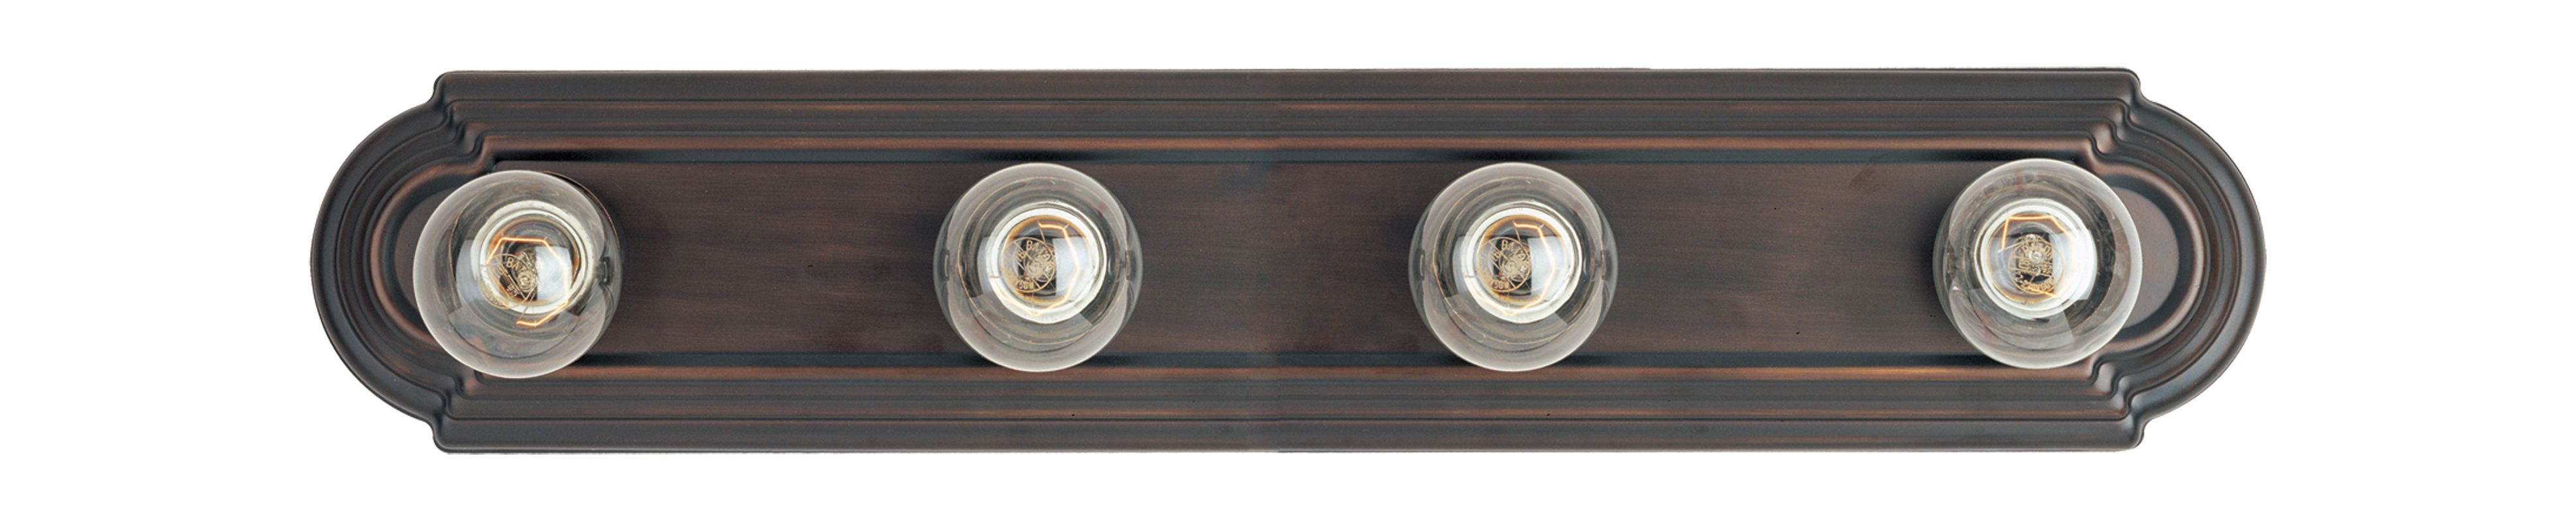 "Maxim 7124 4 Light 24"" Wide Bathroom Fixture from the Essentials -"